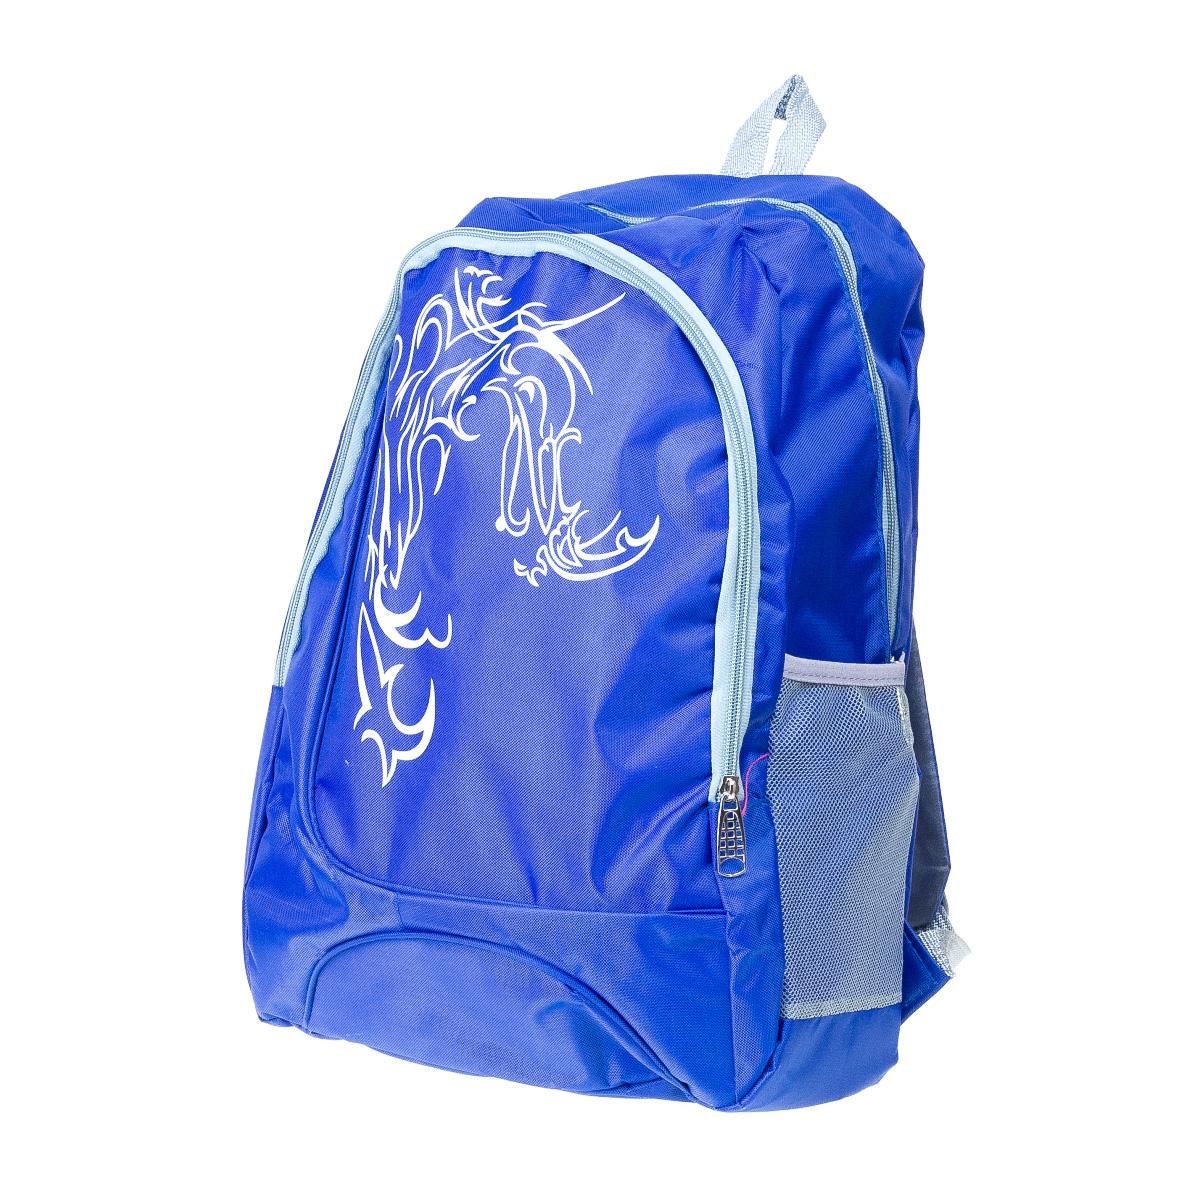 Рюкзак для мальчика HUANGGANG JIAZHI TEXTILE, цвет: синий. 657245-9. Размер 44х30х16 см657245-9